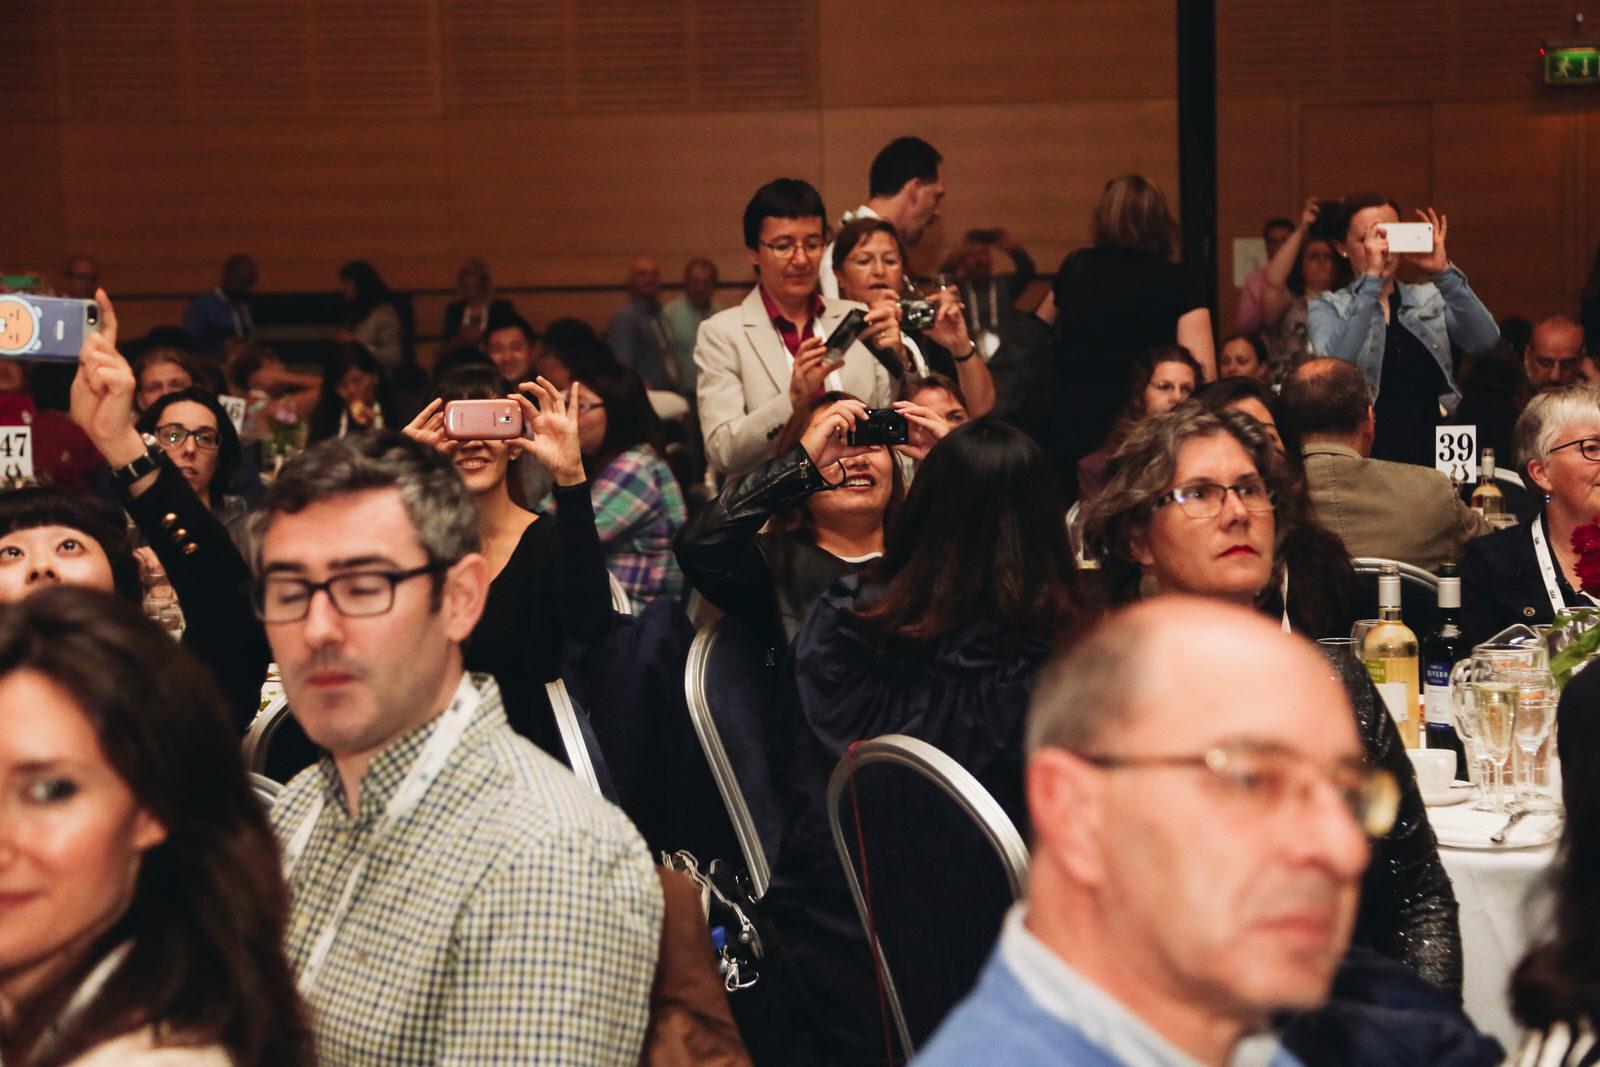 Corporate-conference-photographer-dublin-033.jpg